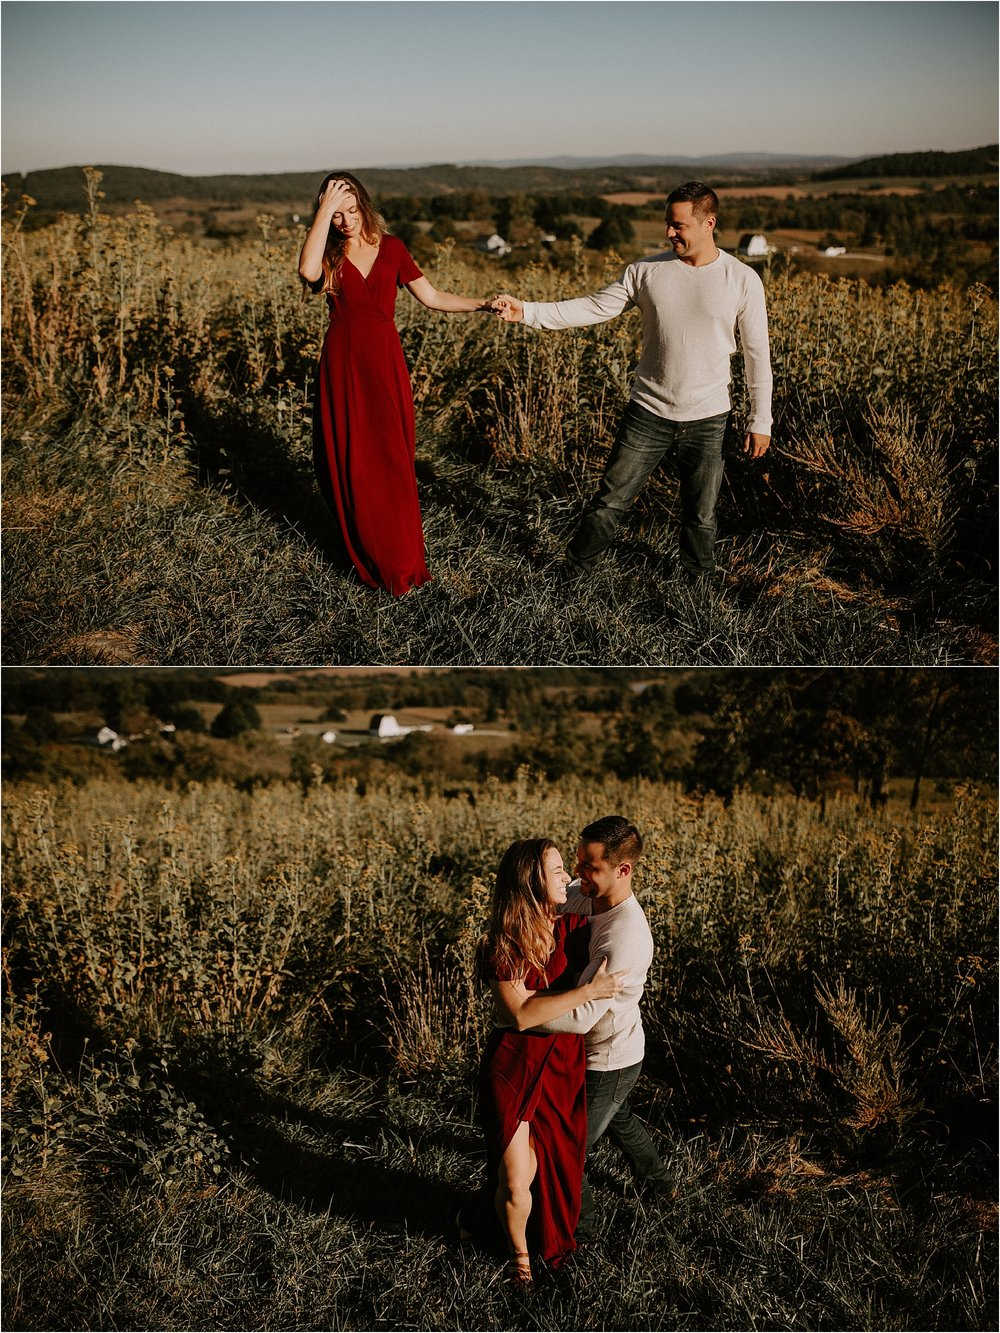 Sarah_Brookhart_Baltimore_Wedding_Photographer_0002.jpg